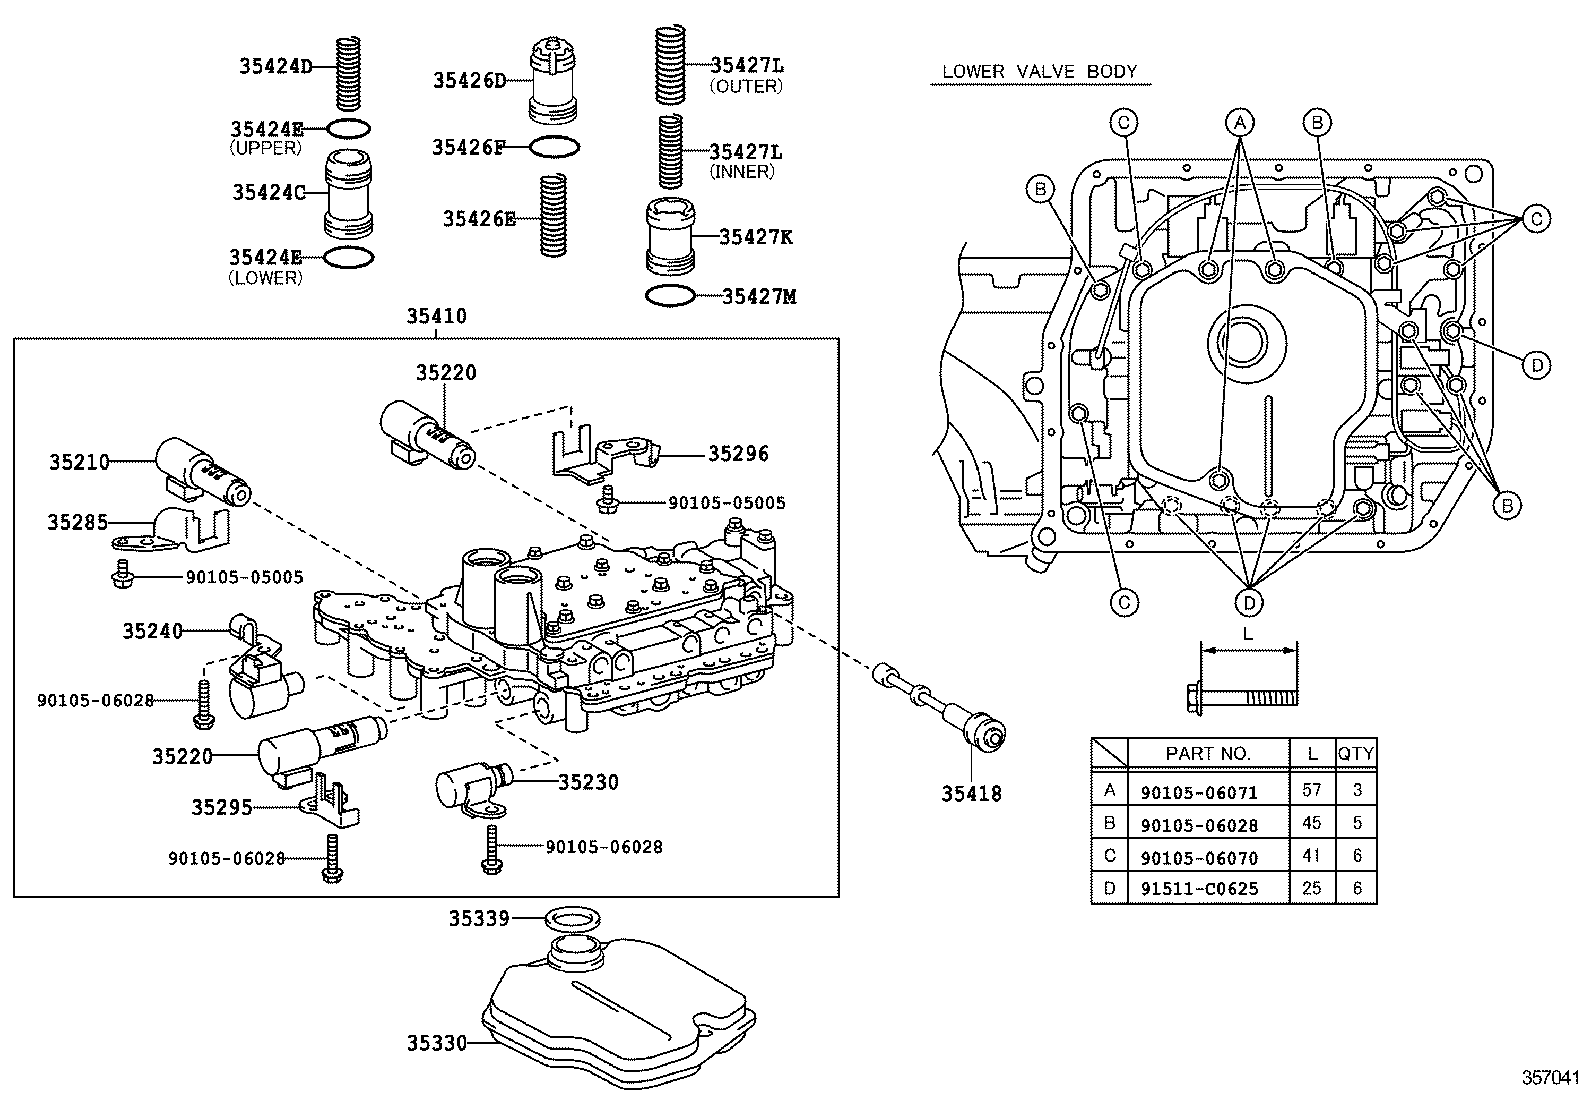 Mtm Toyota Transmission Diagram. Toyota. Auto Wiring Diagram